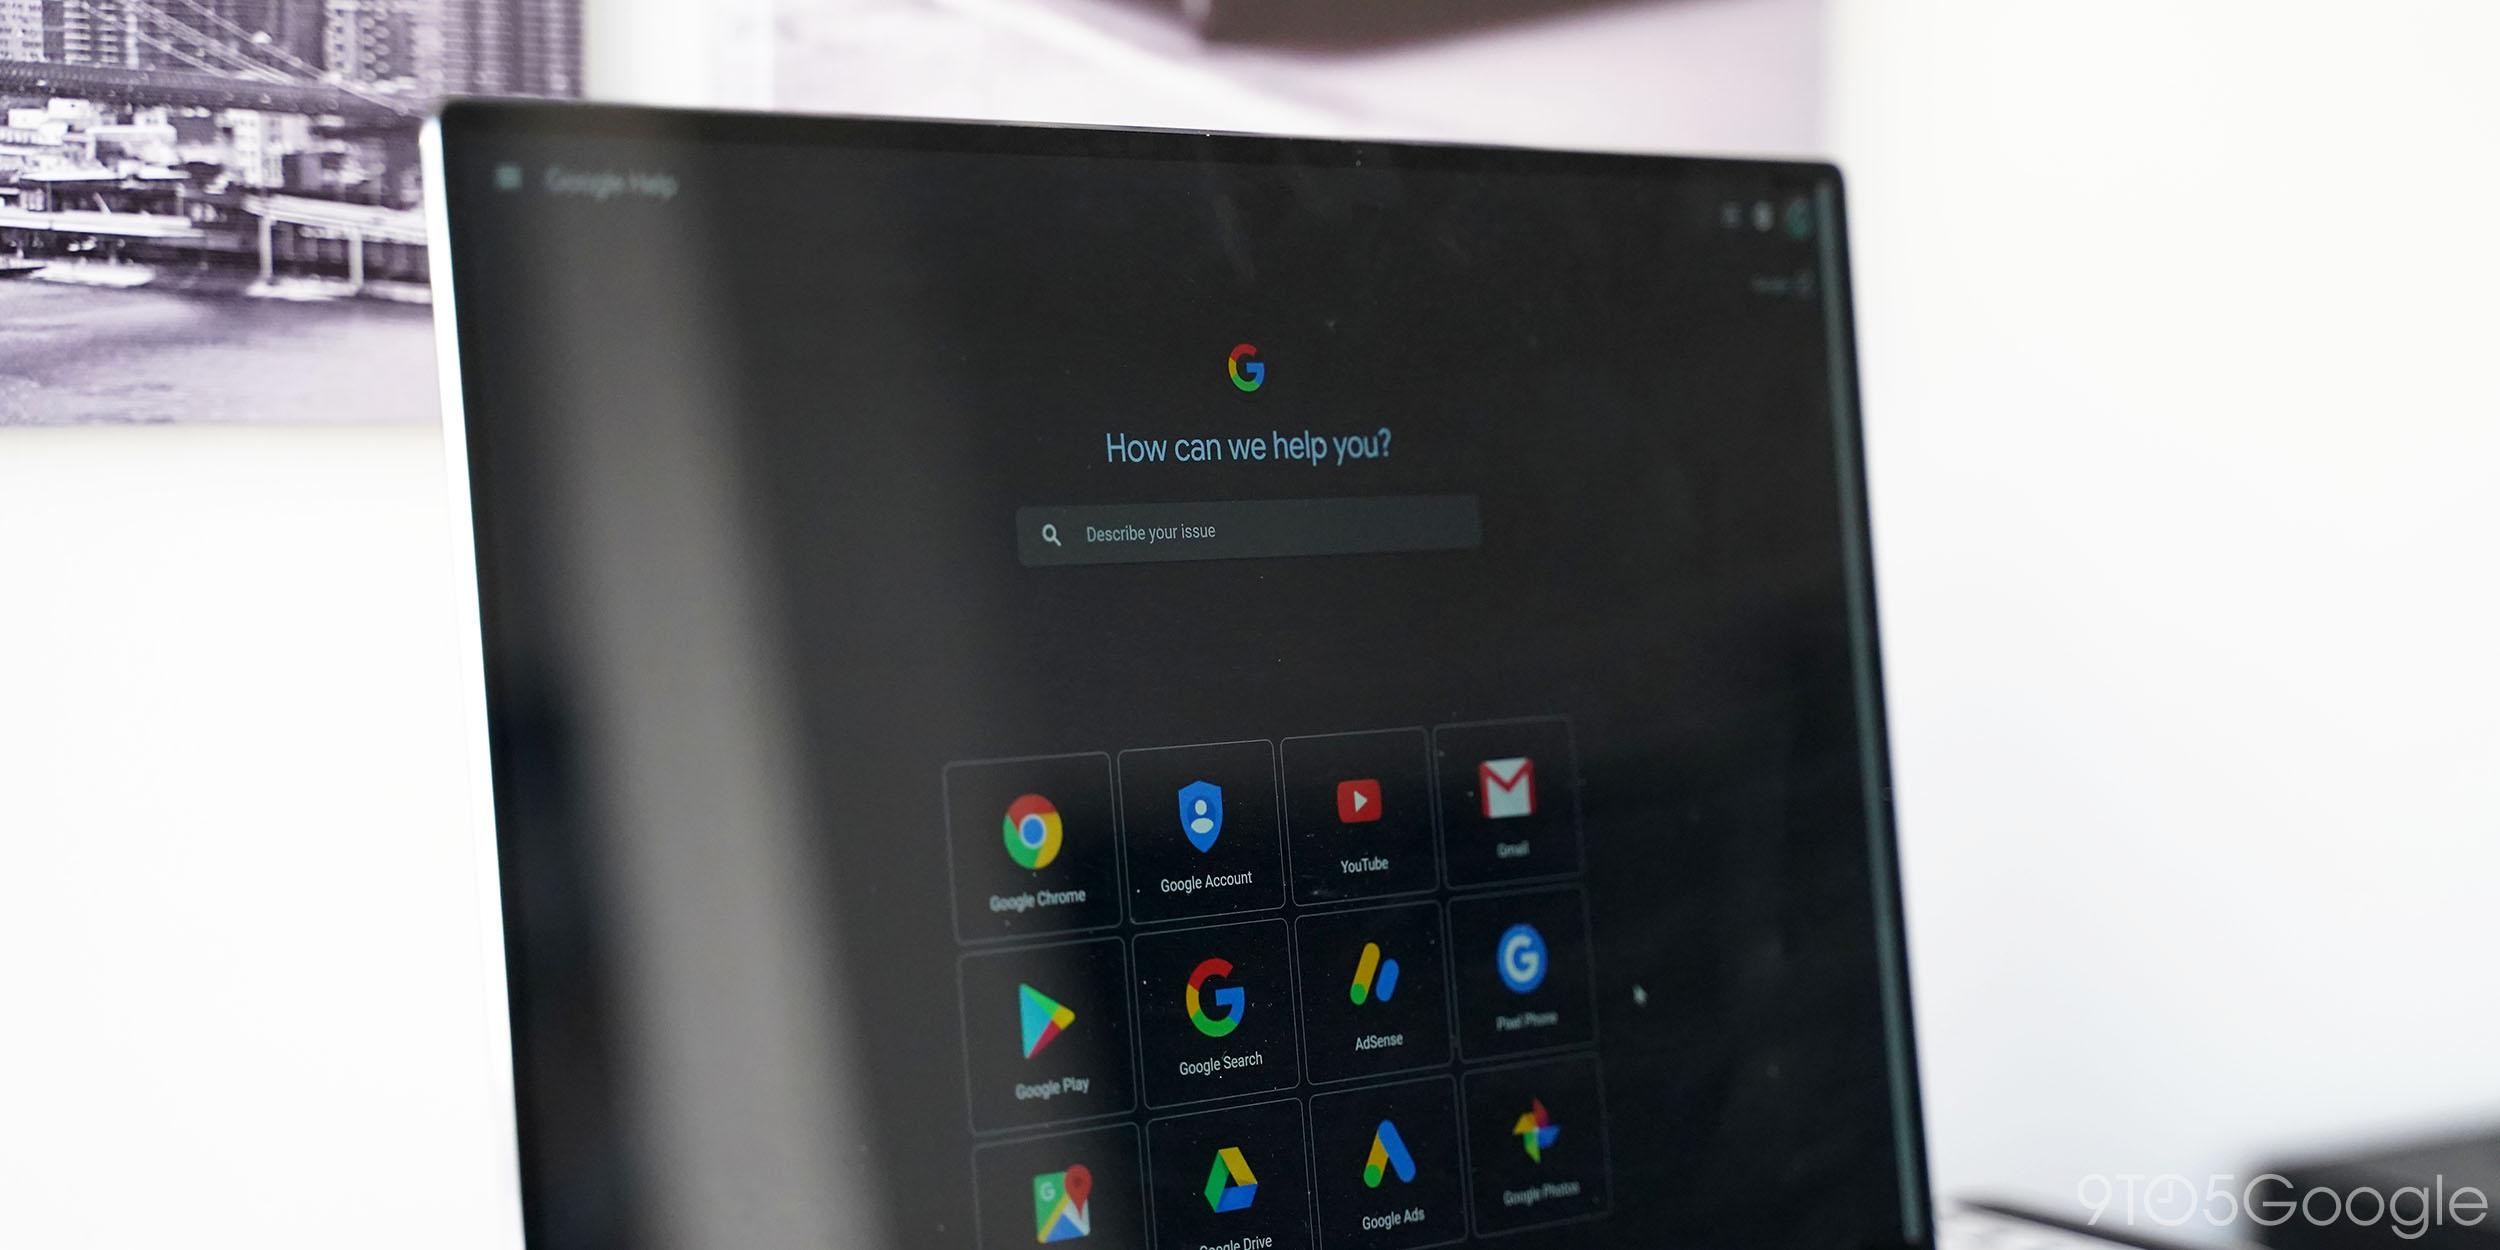 Google Dark Mode app roundup: Everything available so far - 9to5Google